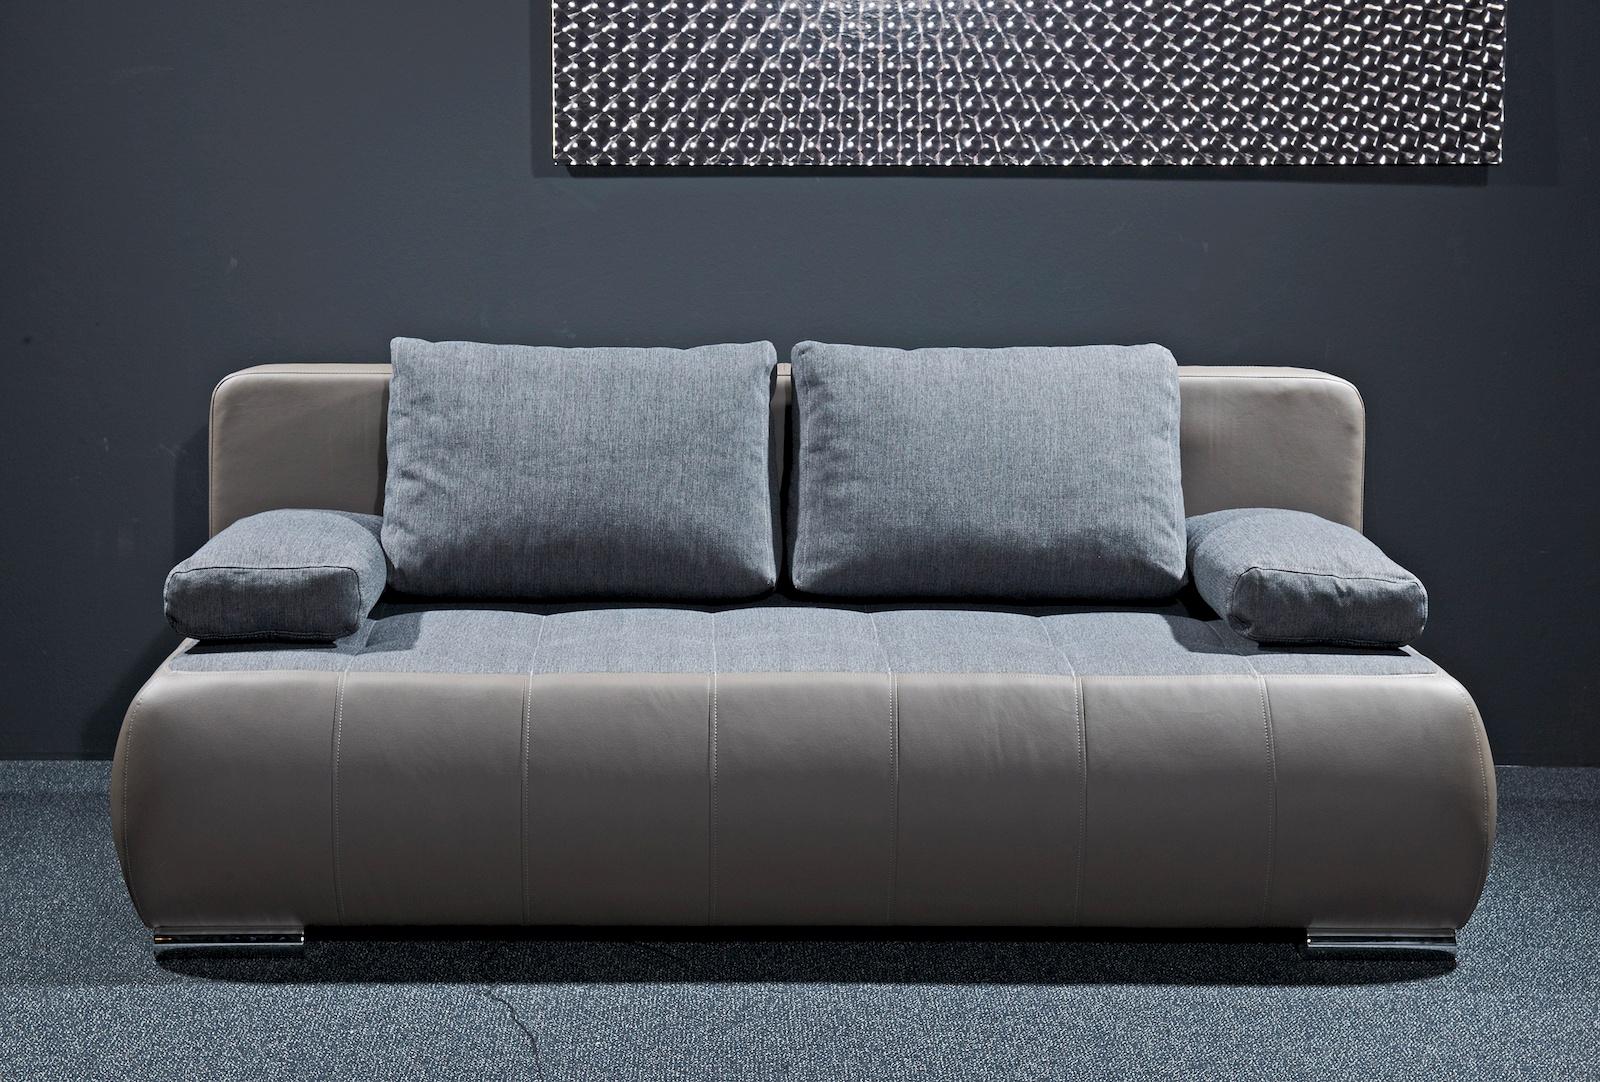 Sonderpreis schlafsofa ohio couch sofa lederoptik for Sofa schlafcouch